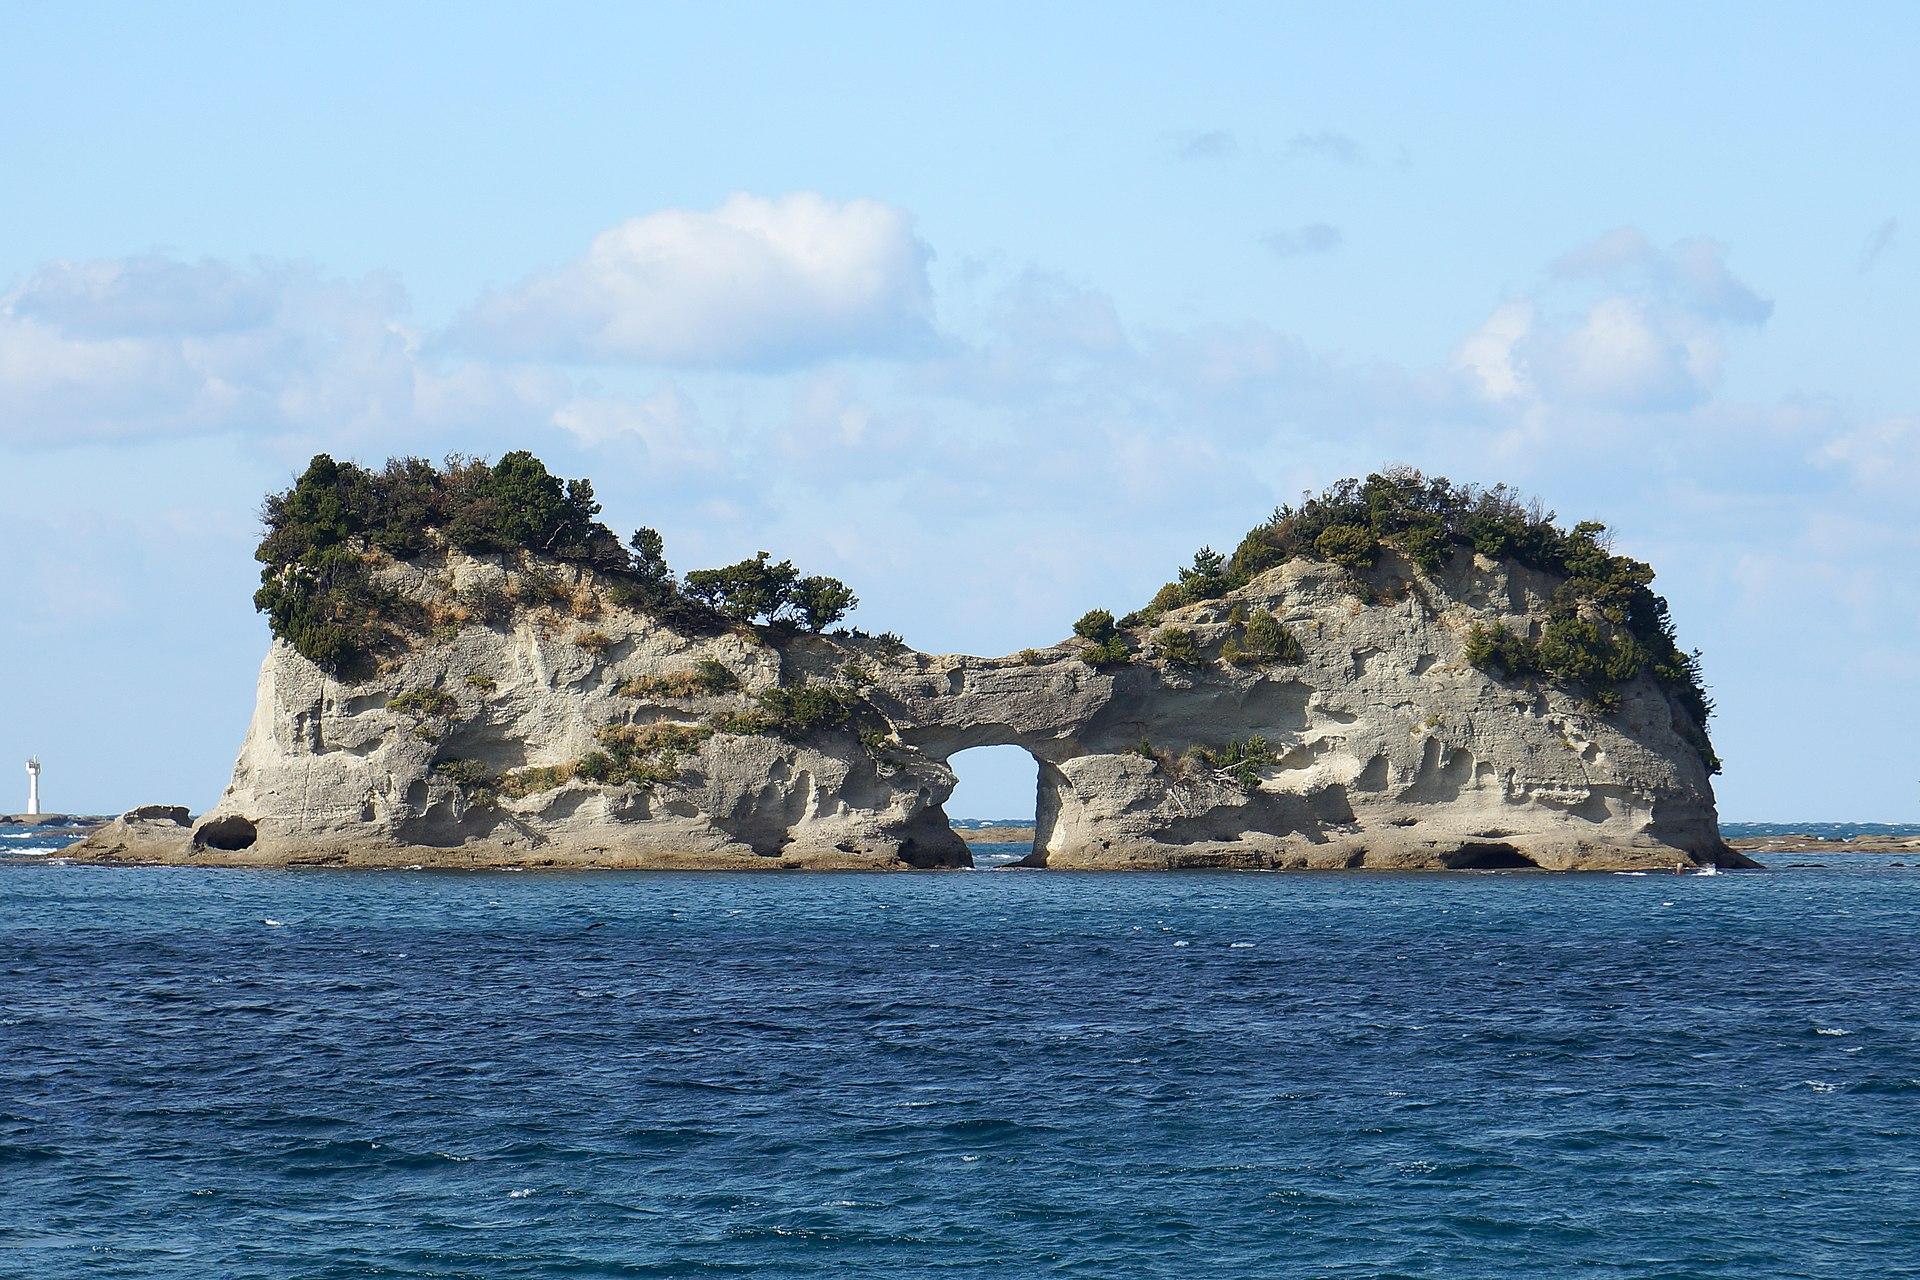 131222 Engetsu Island Shirahama Wakayama pref Japan01bs.jpg